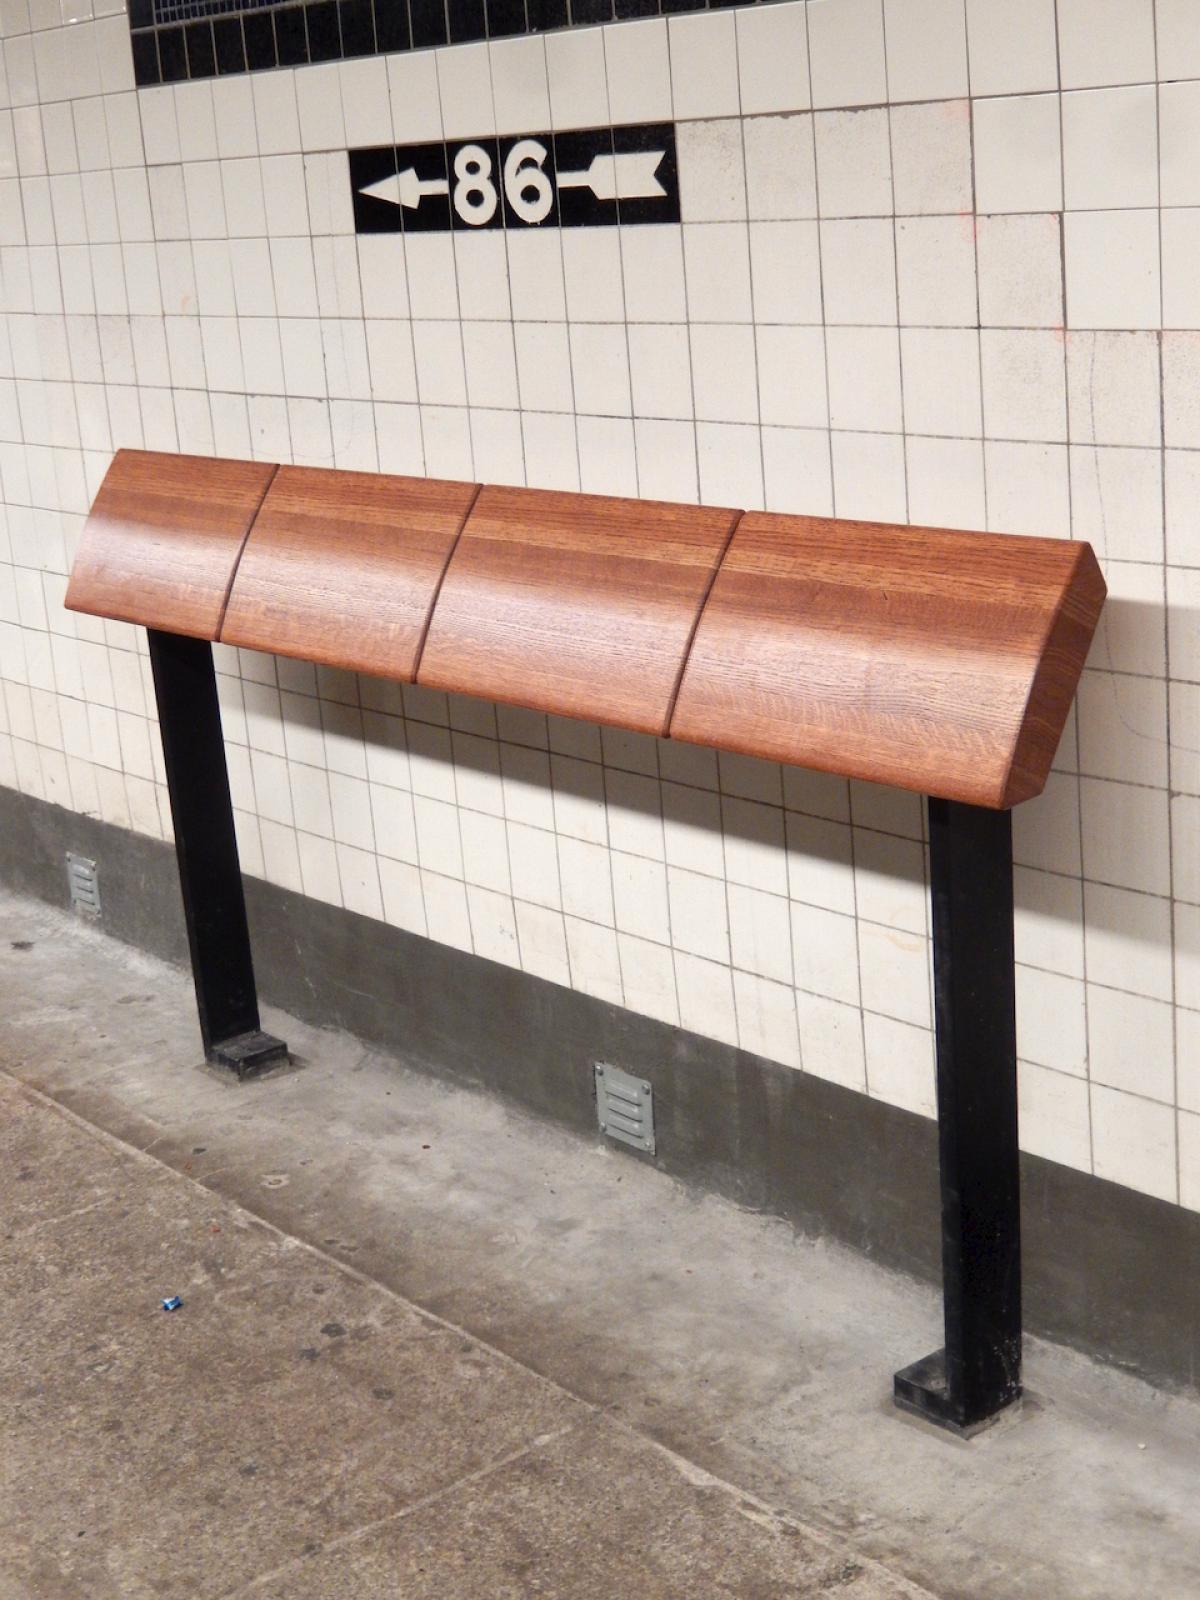 NYC Subway Benches Part 2 4